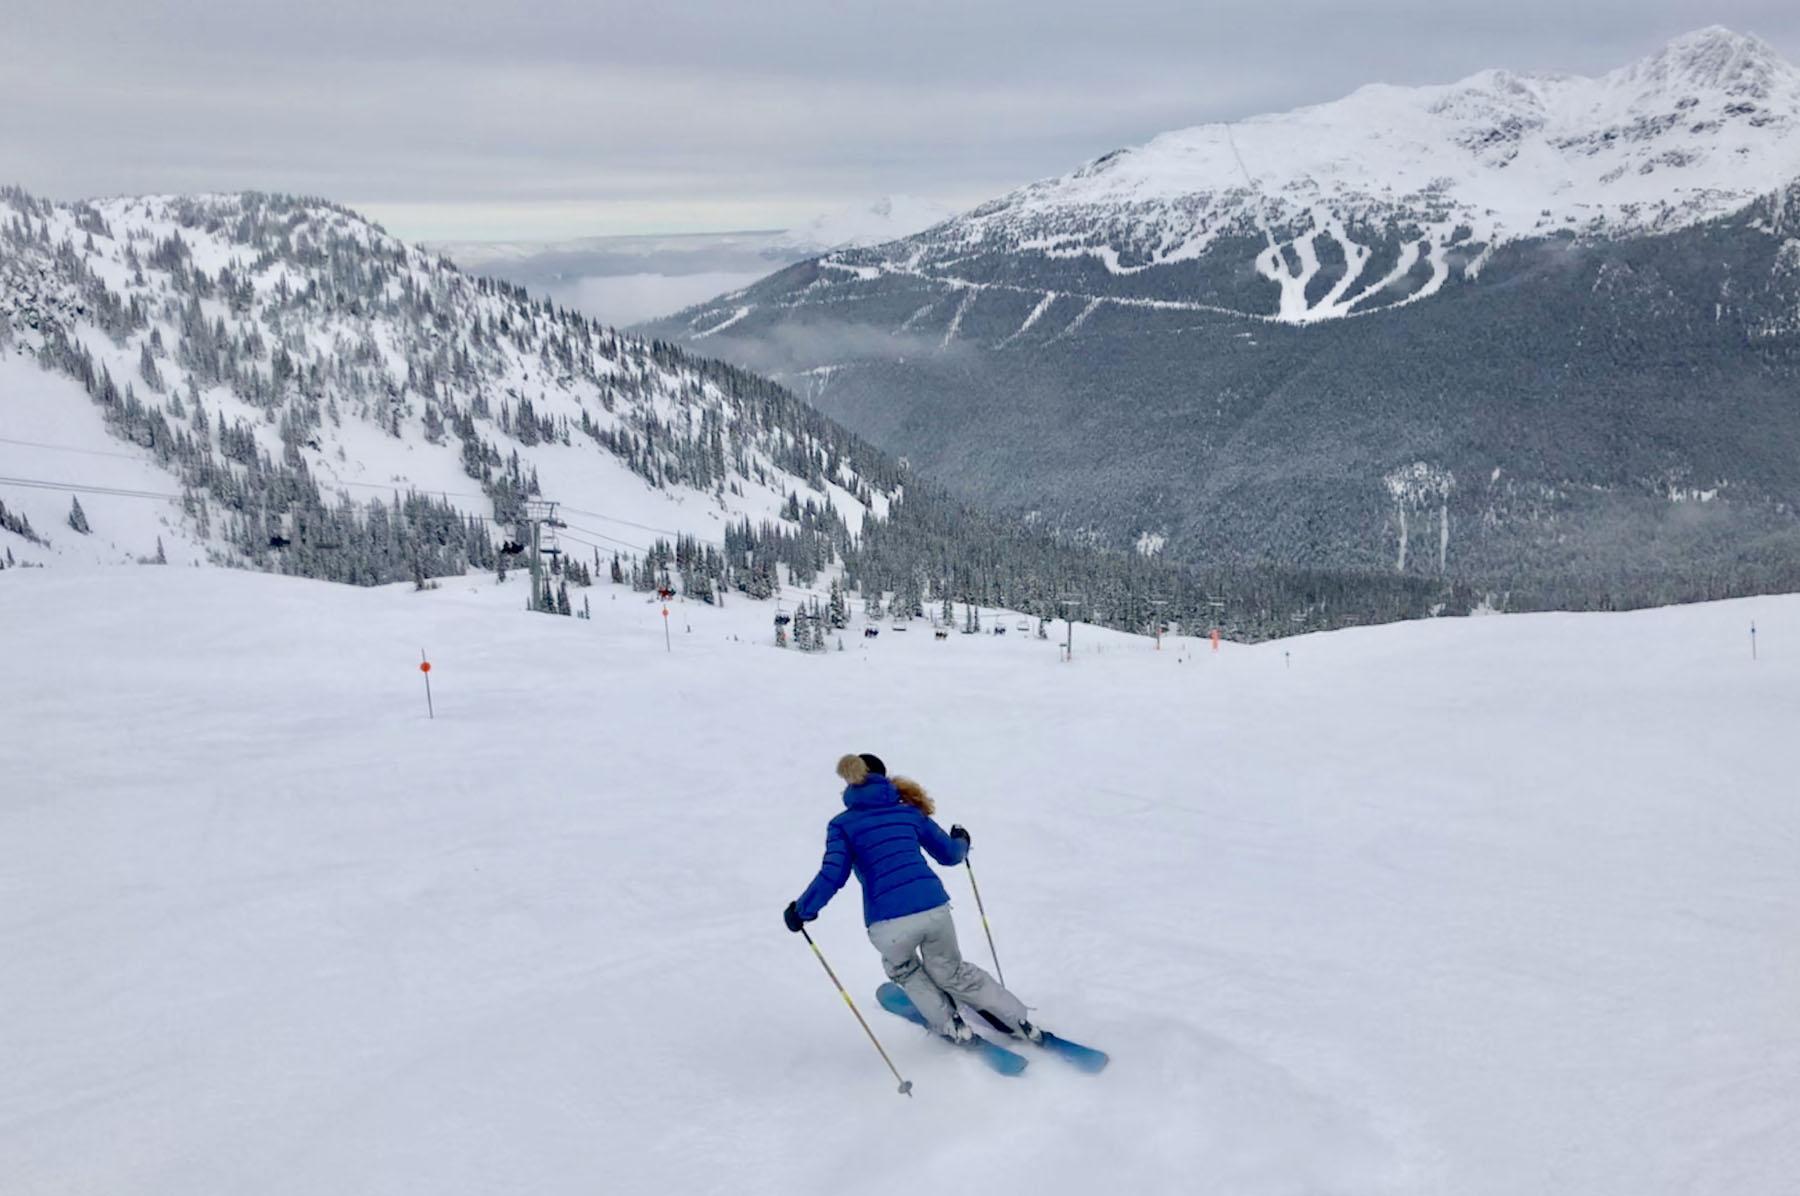 whistler blackcomb family ski guide | familyskitrips